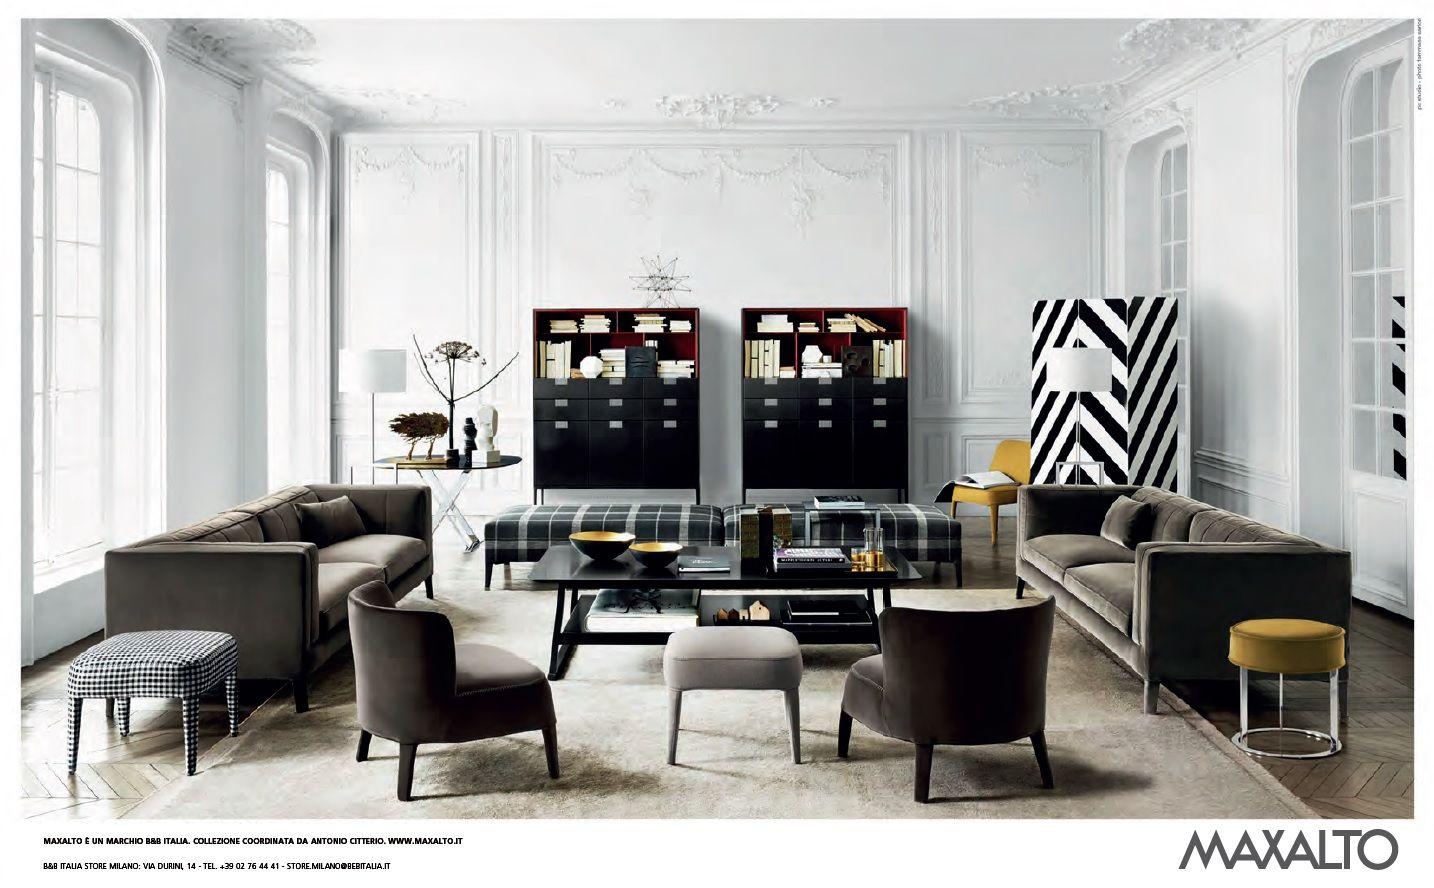 MAXALTO: NEW 2015 ADVERTISING CAMPAIGN | Furniture | Pinterest ...